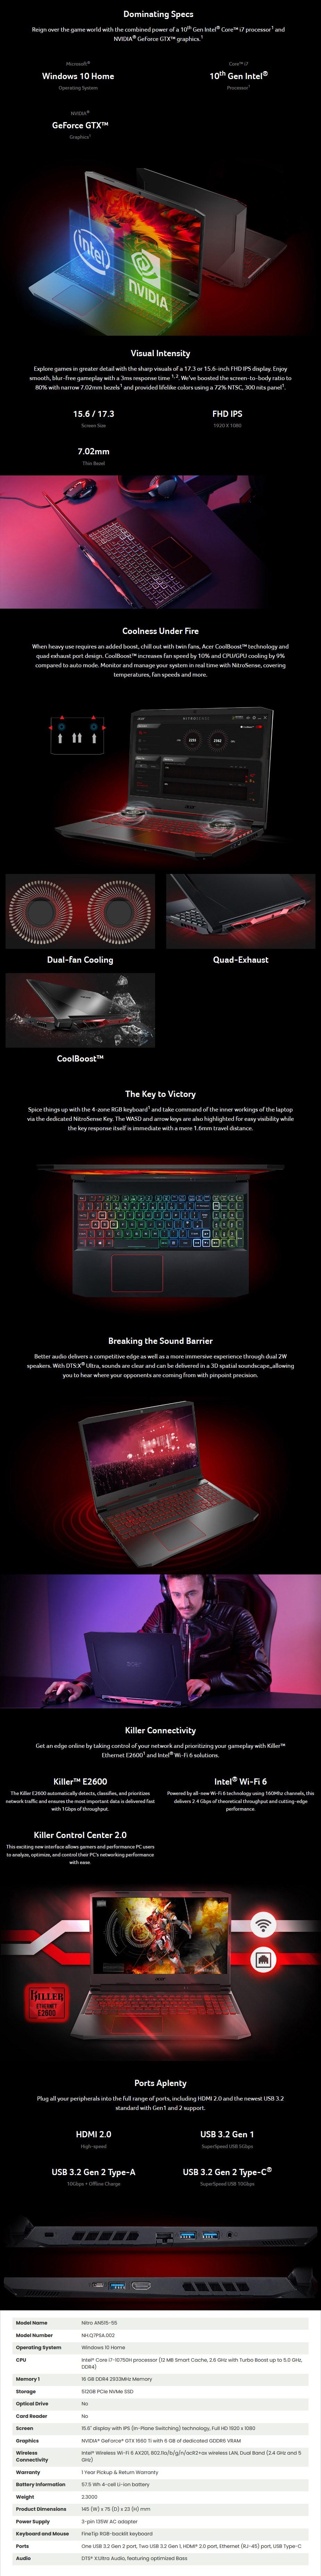 acer-nitro-5-156-laptop-i710750h-16gb-512gb-gtx1660ti-win10-home-ac37226-5.jpg